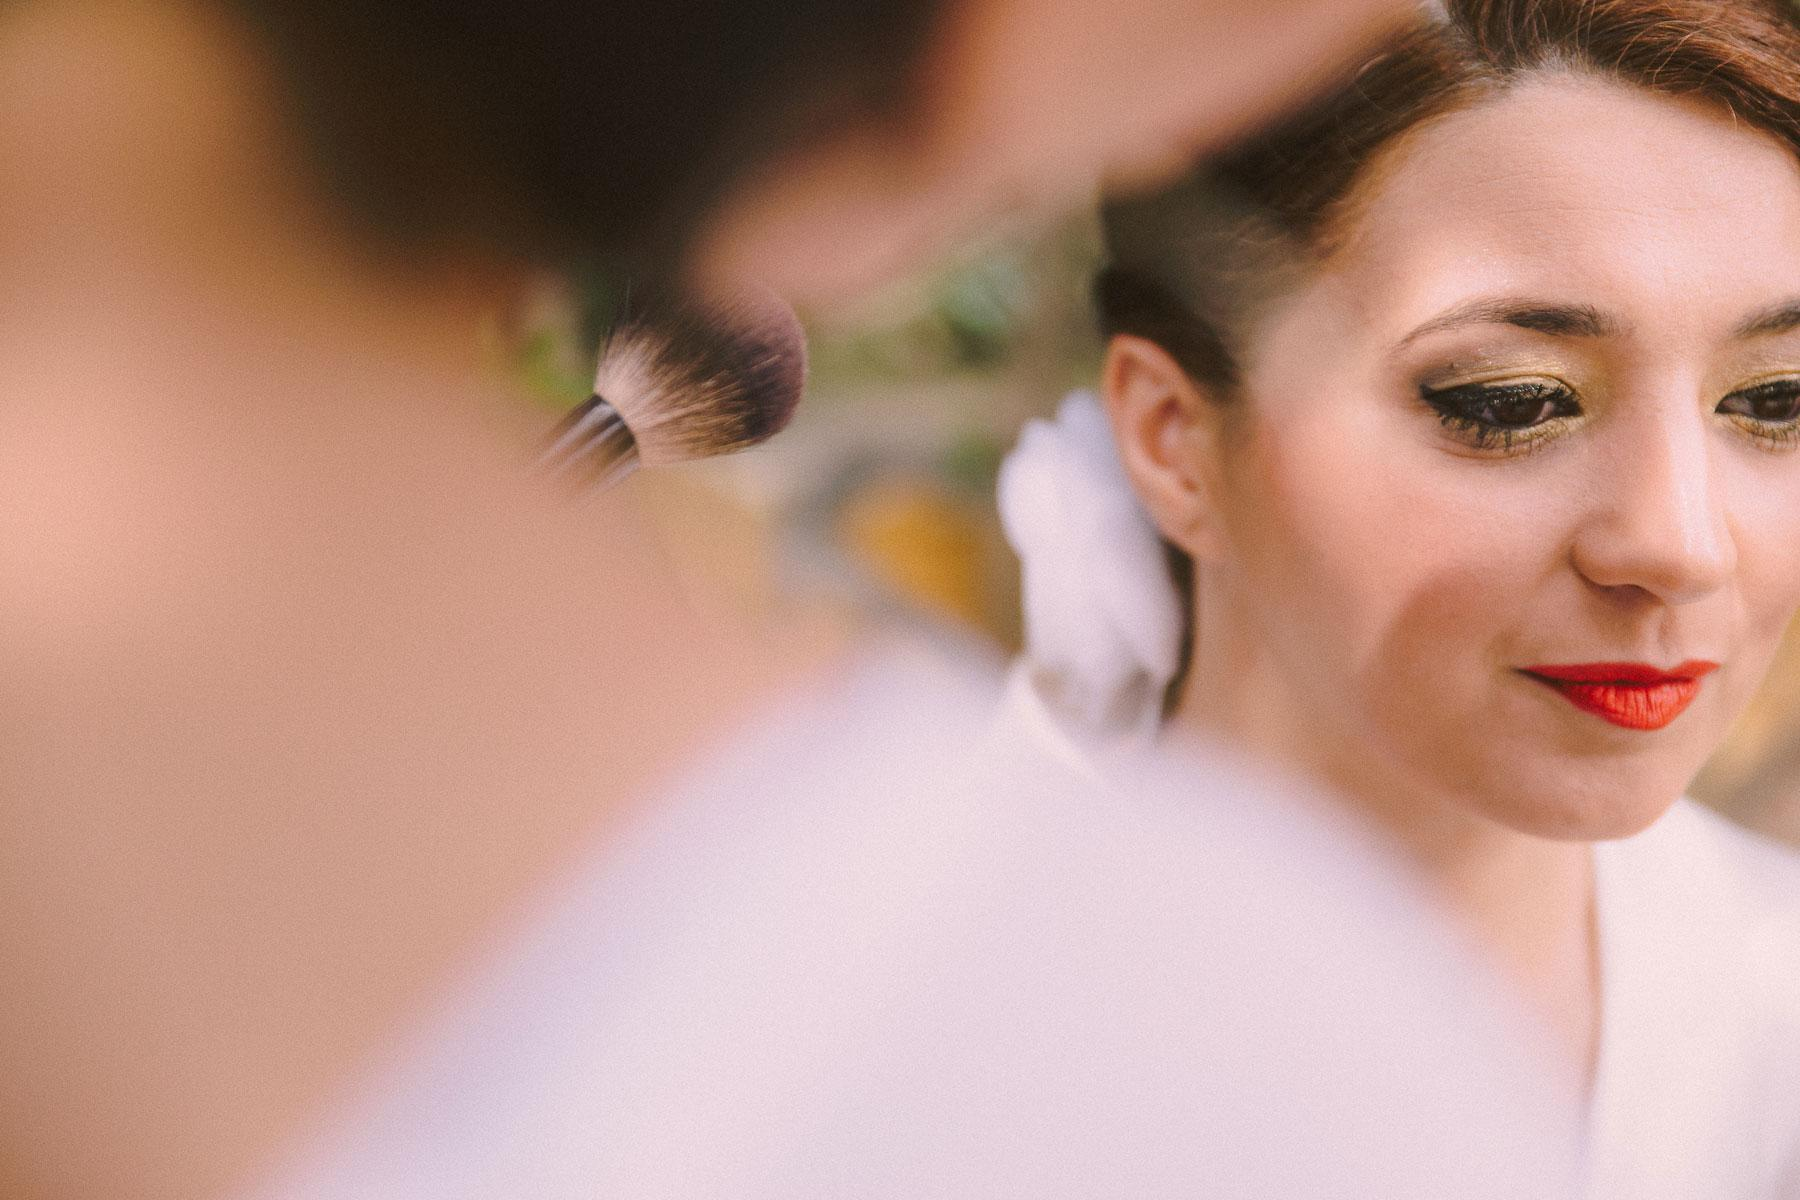 destination-wedding-in-lake-aitoliko-messolonghi-in-greece025